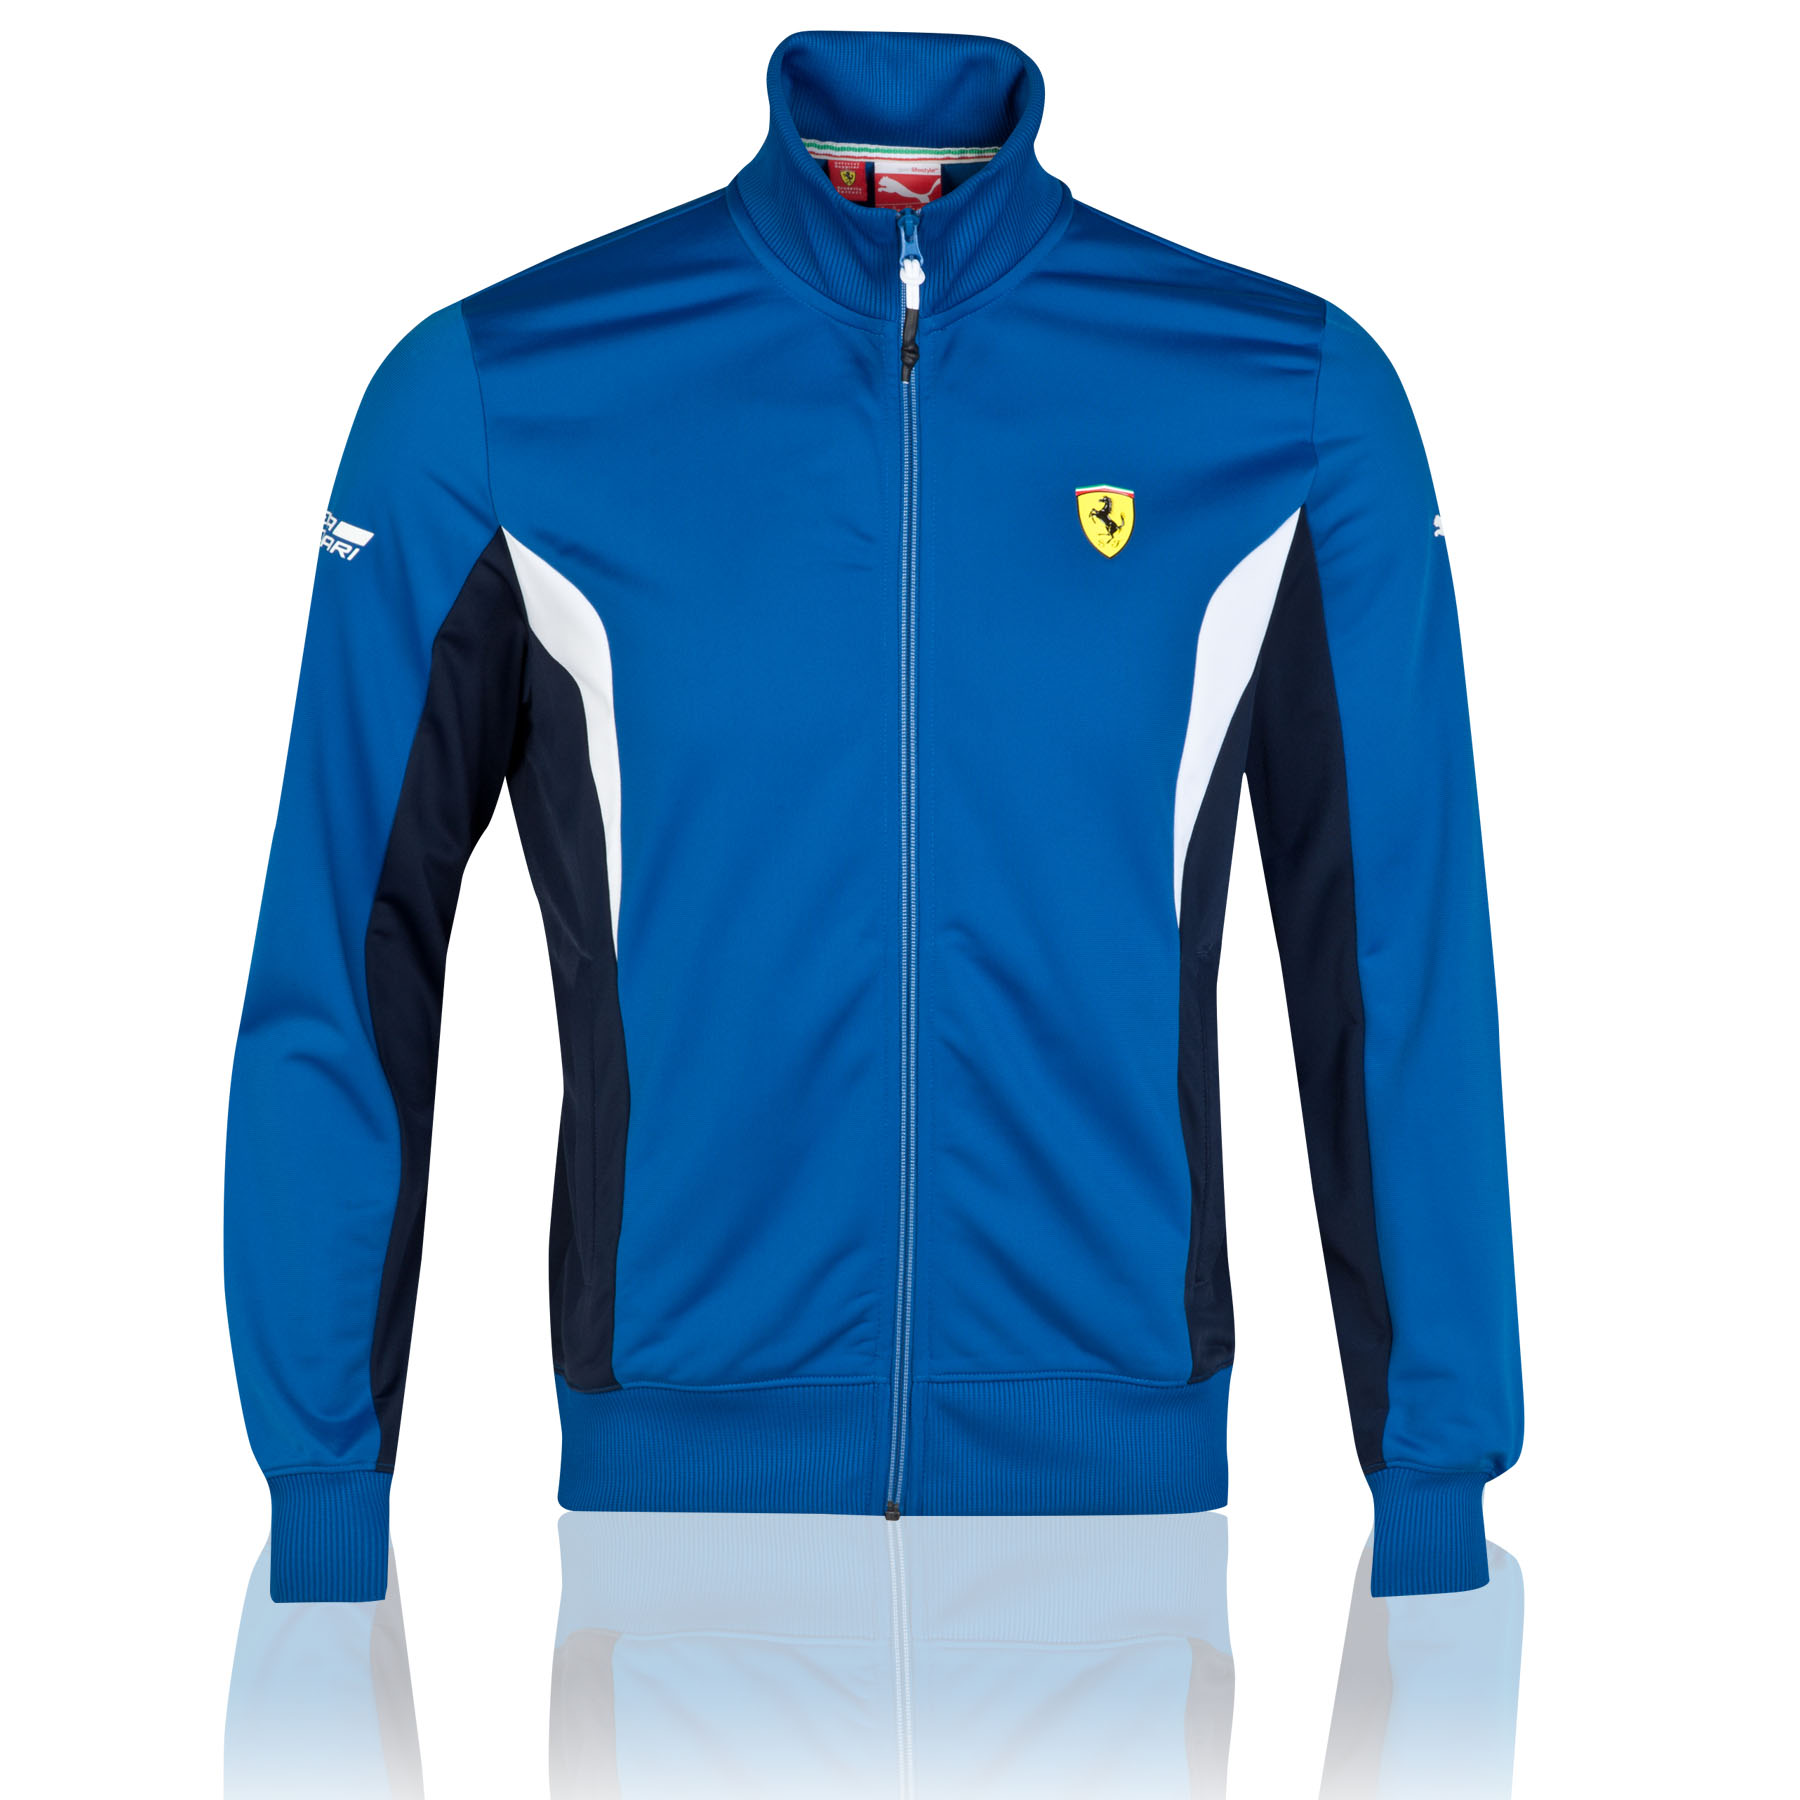 Scuderia Ferrari Track Jacket - Blue